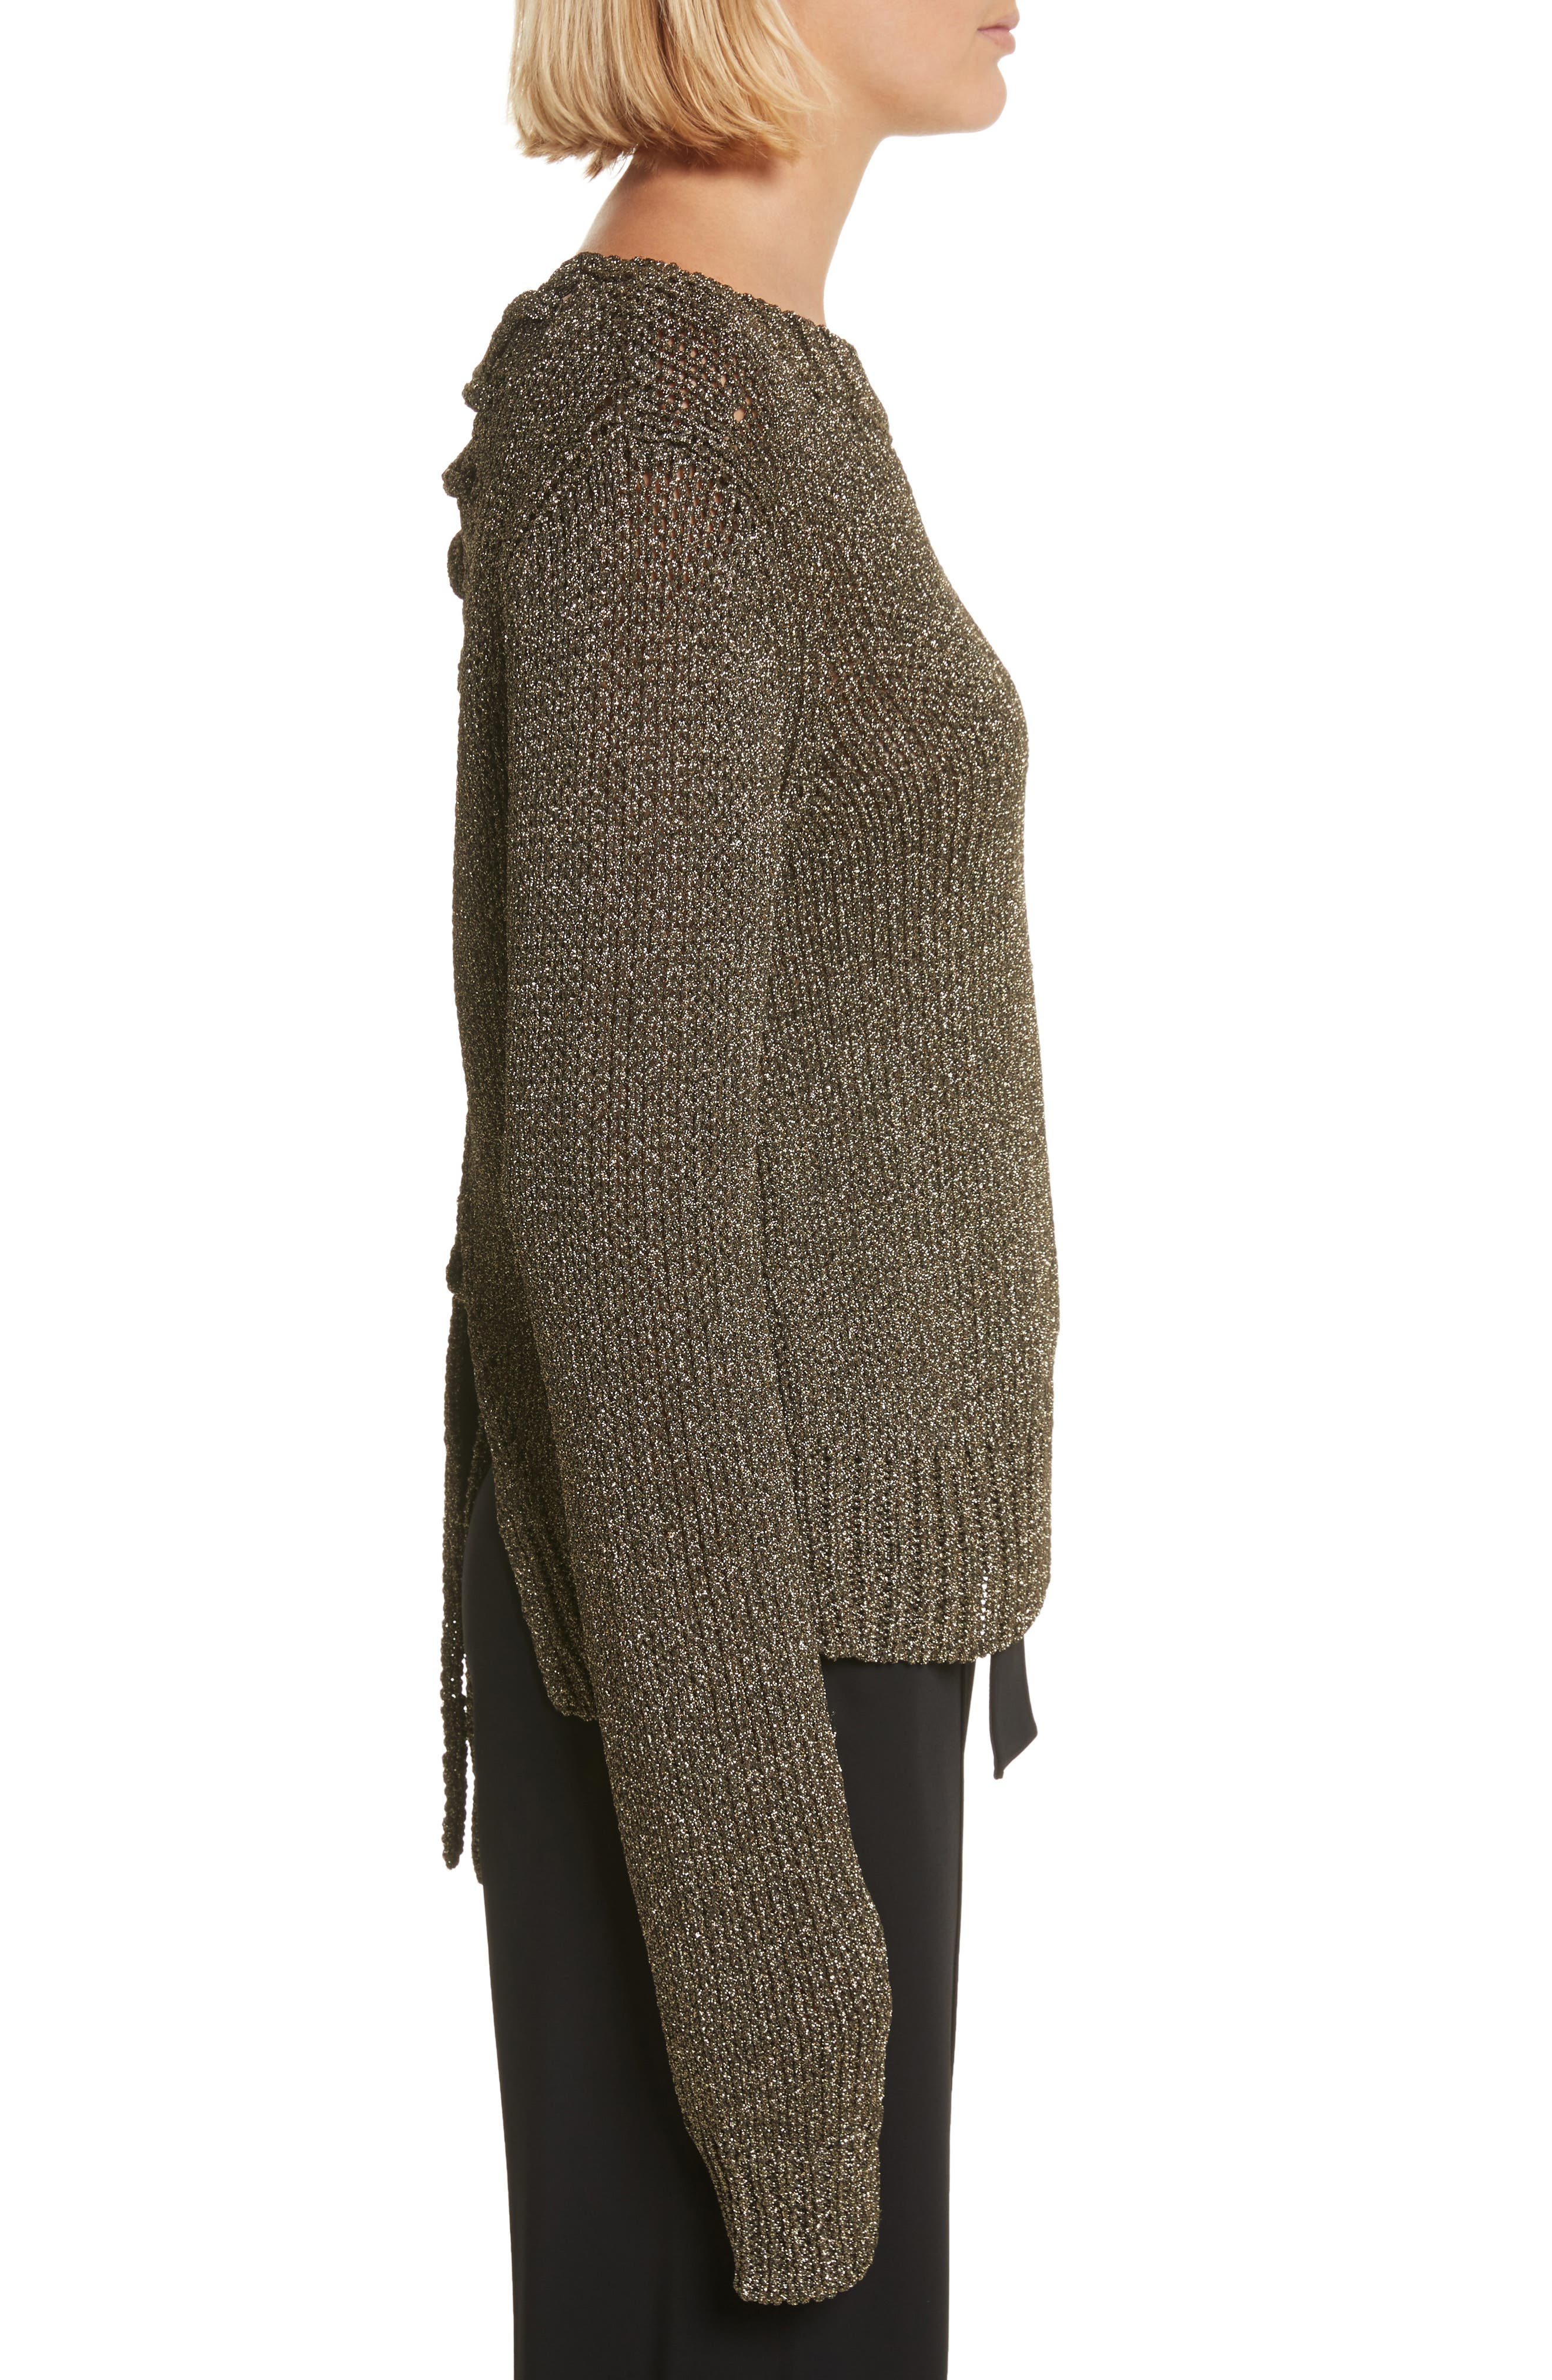 Alternate Image 3  - A.L.C. Marjorie Lace-Up Back Sweater